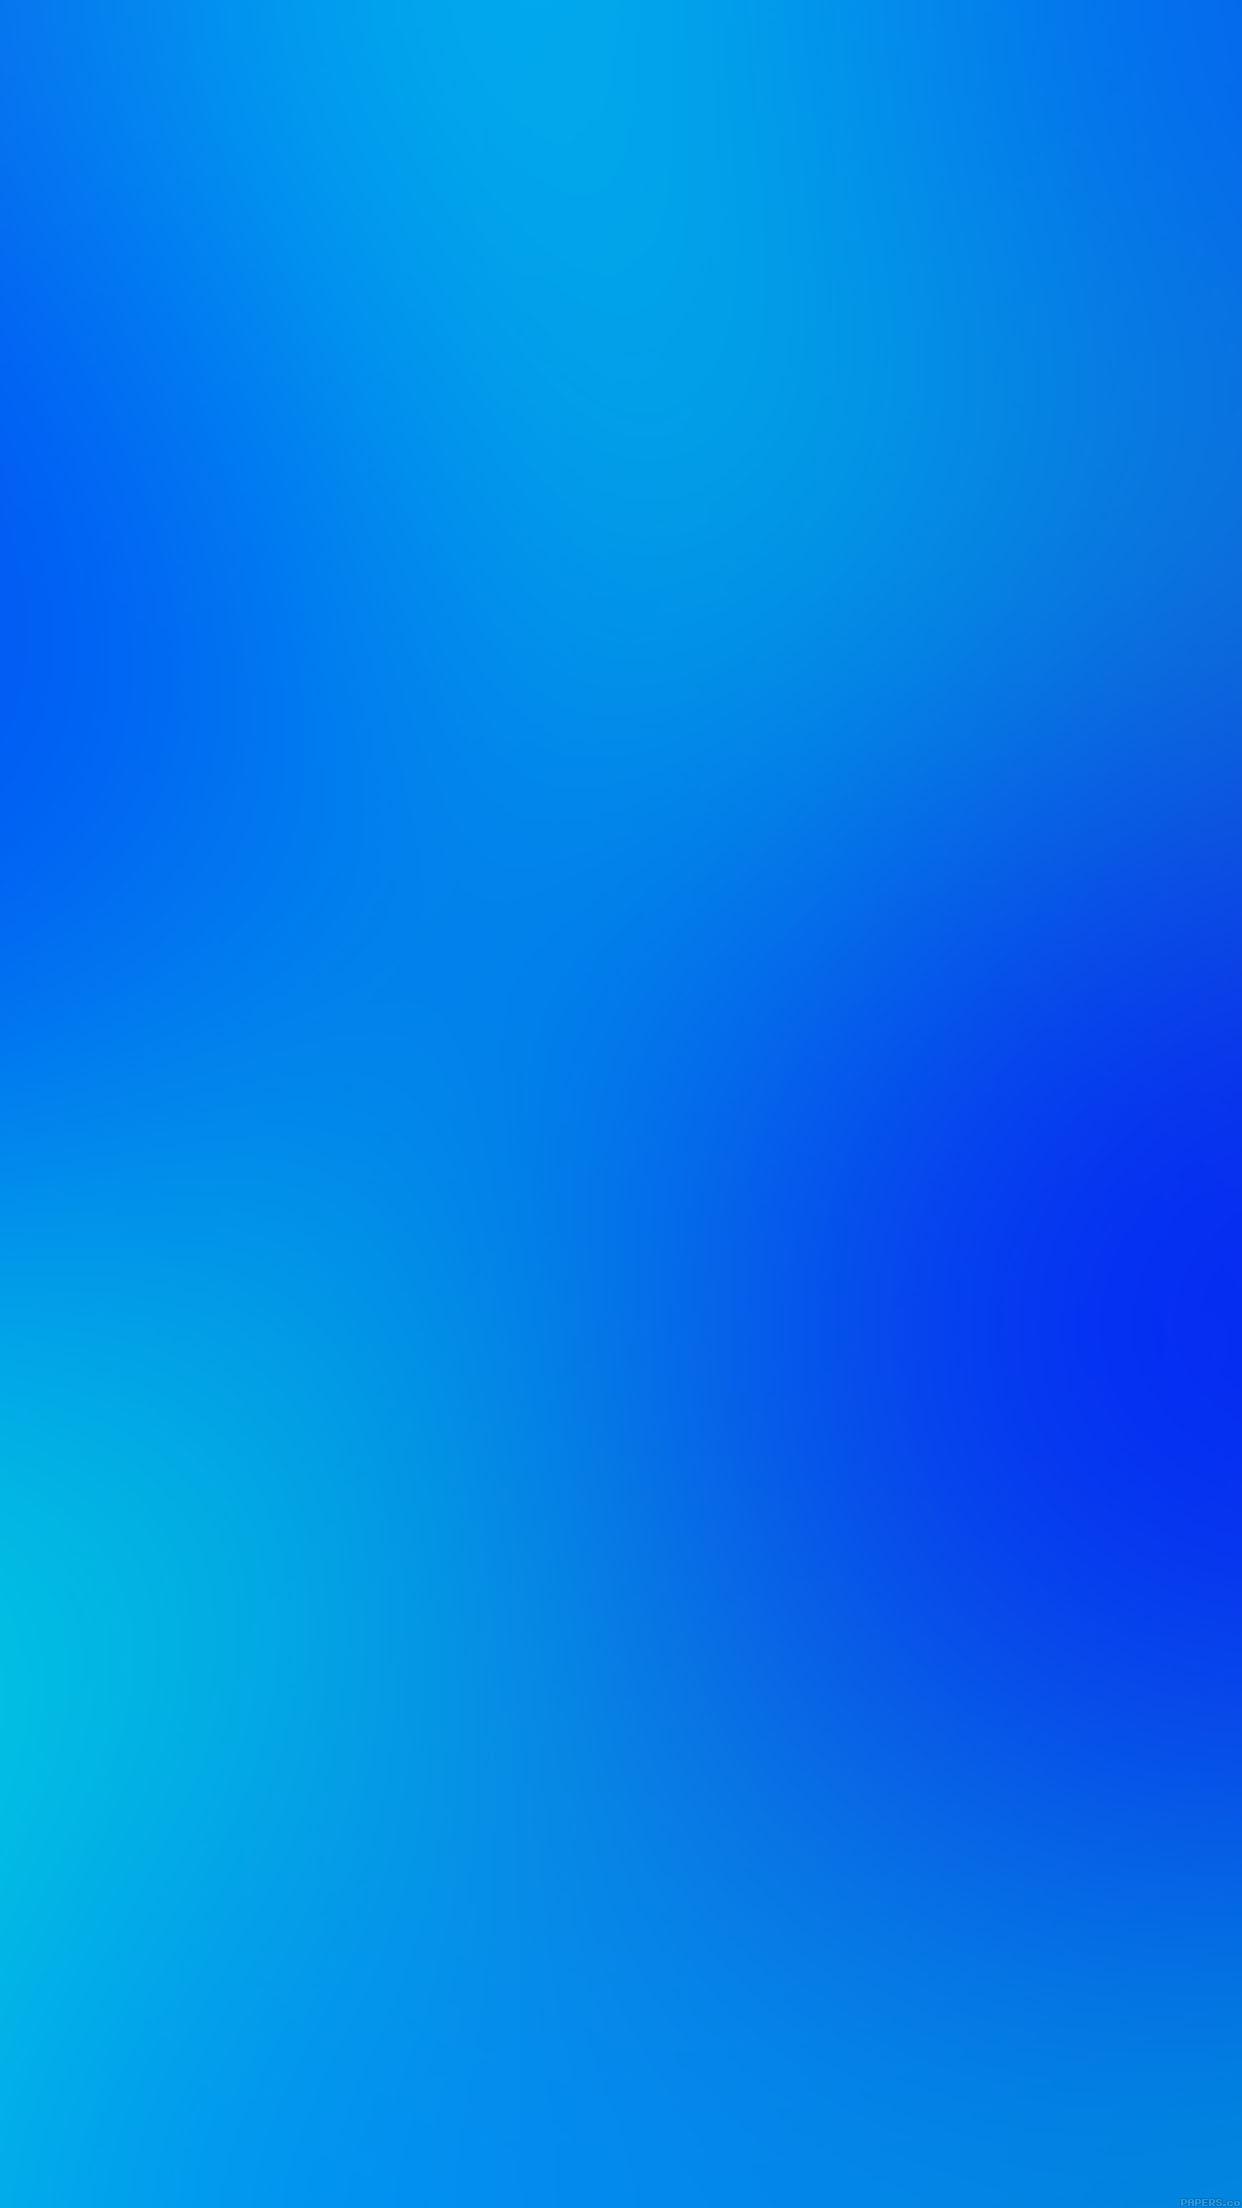 Iphonepapers Sb11 Wallpaper Blue Pimple Blur